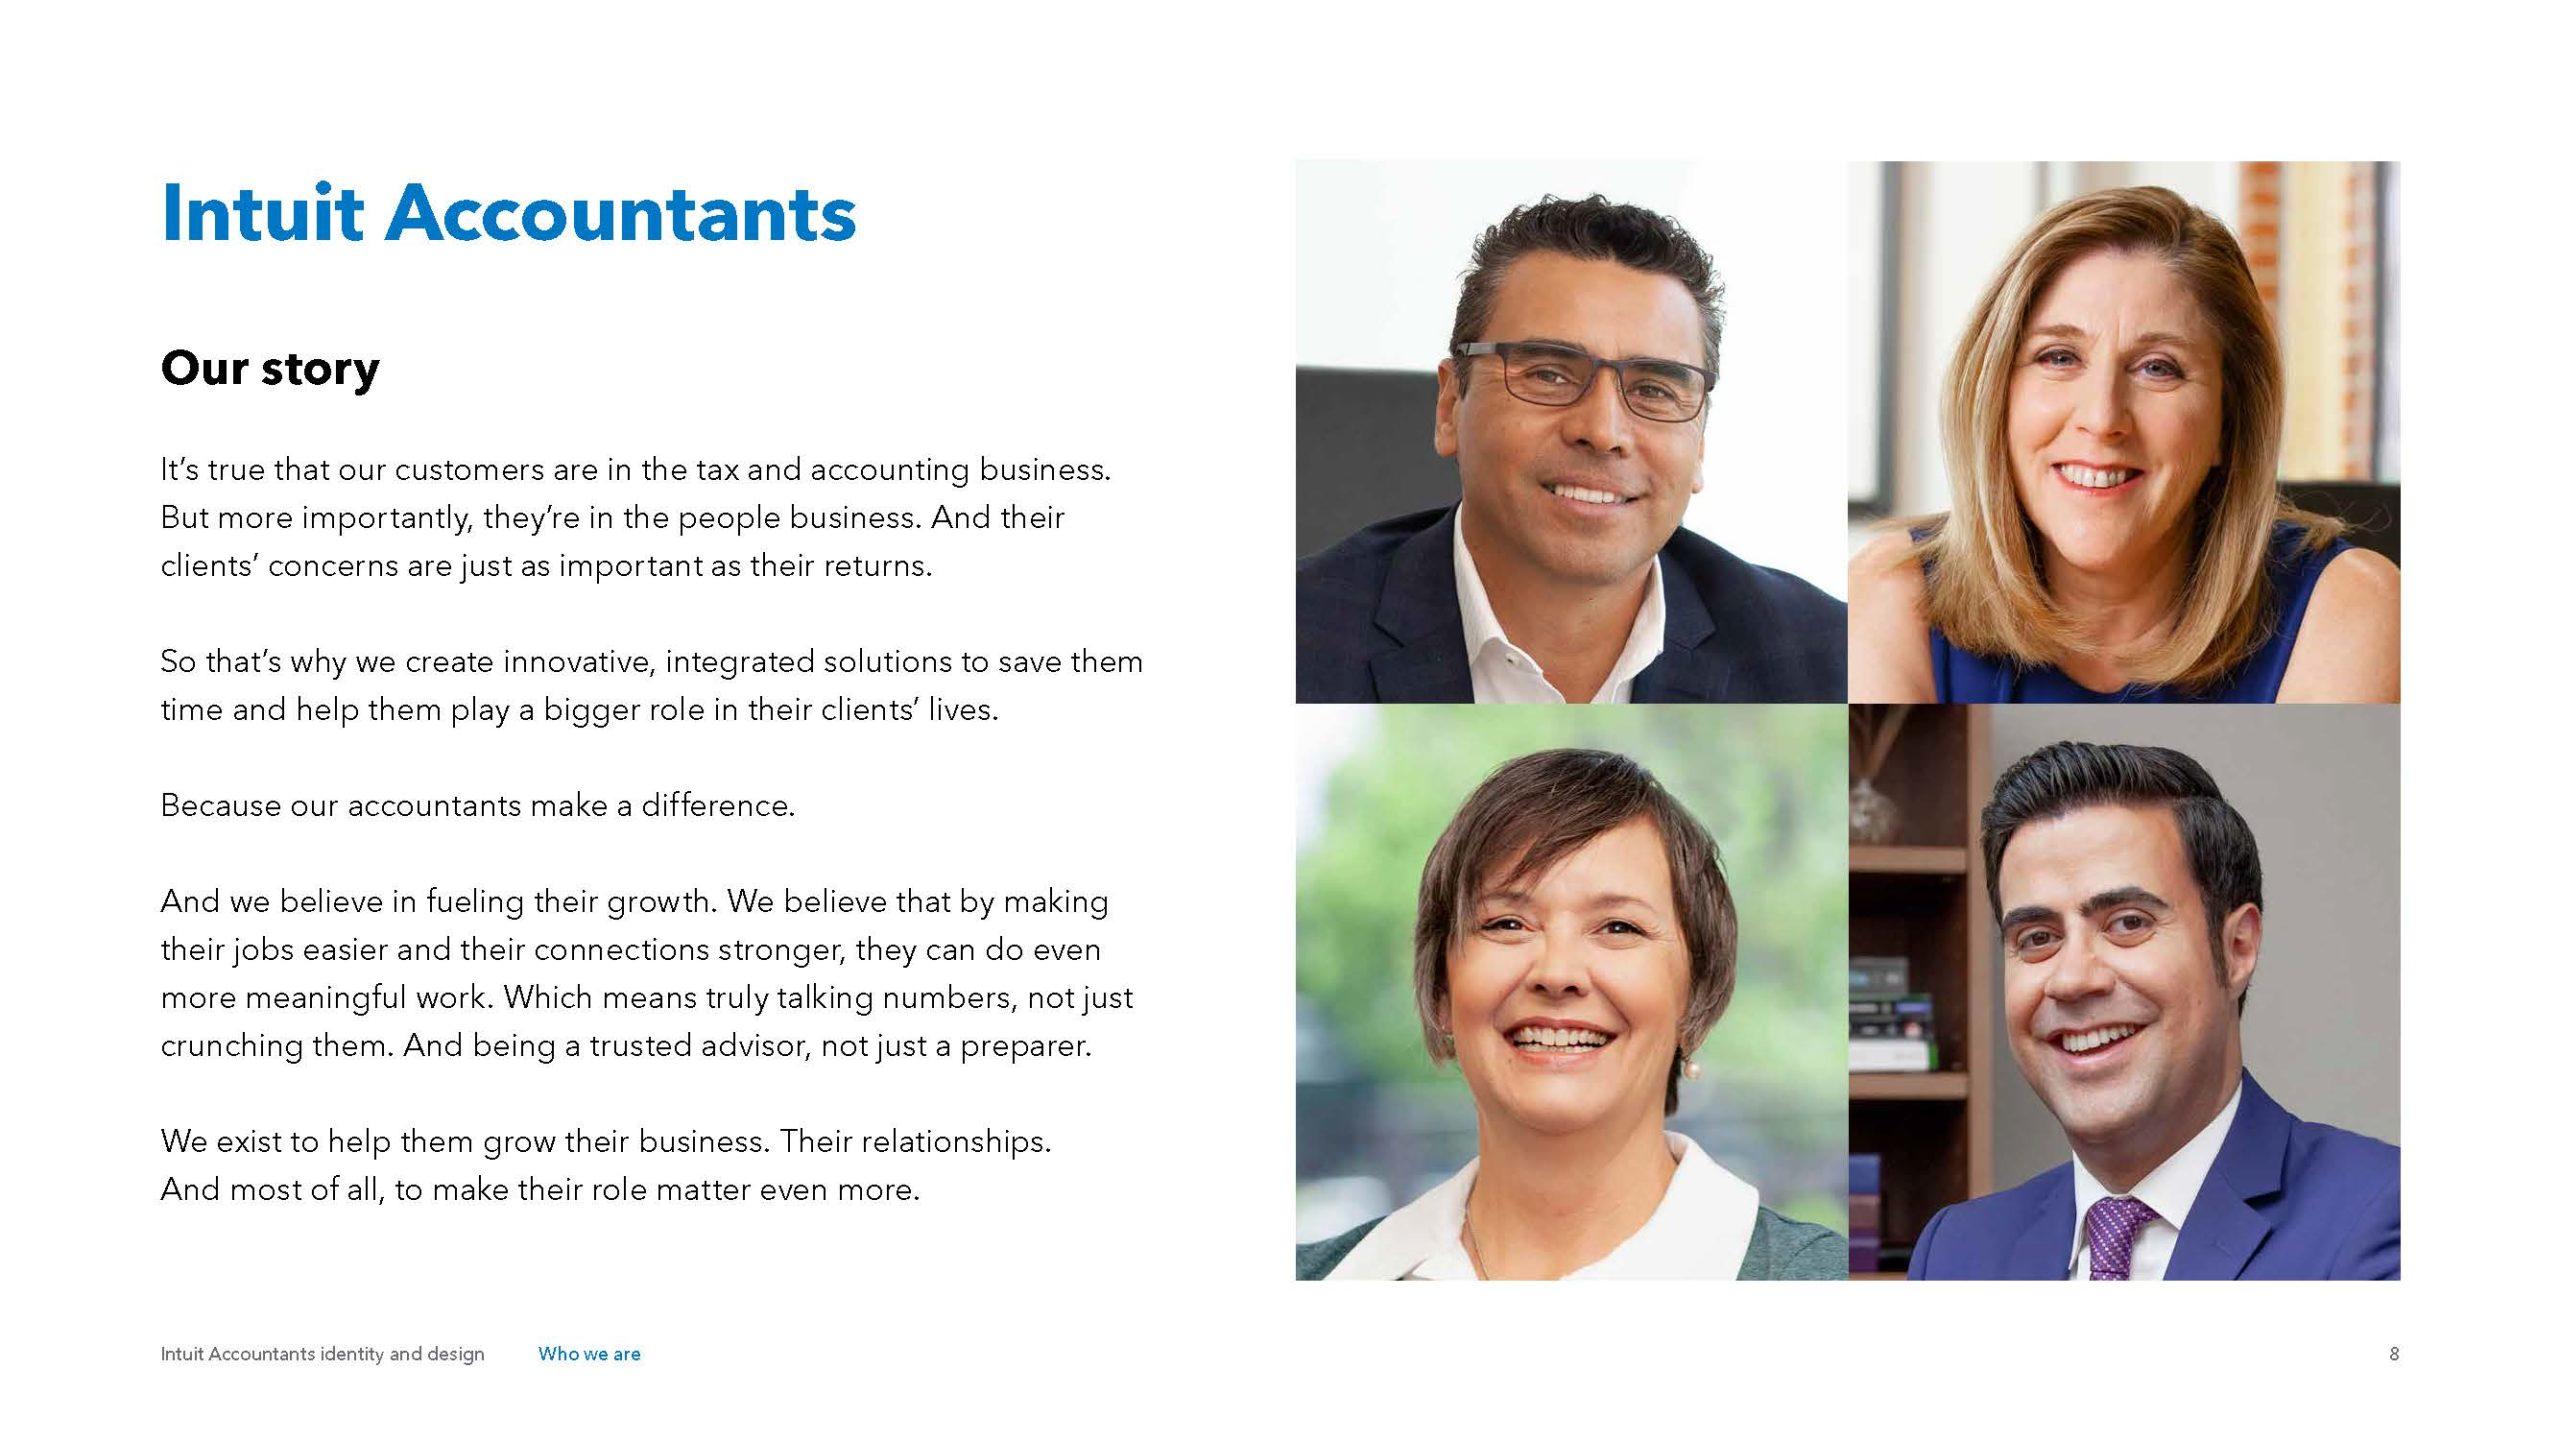 IntuitAccountants-IdentityGuidelines-2020_Page_08